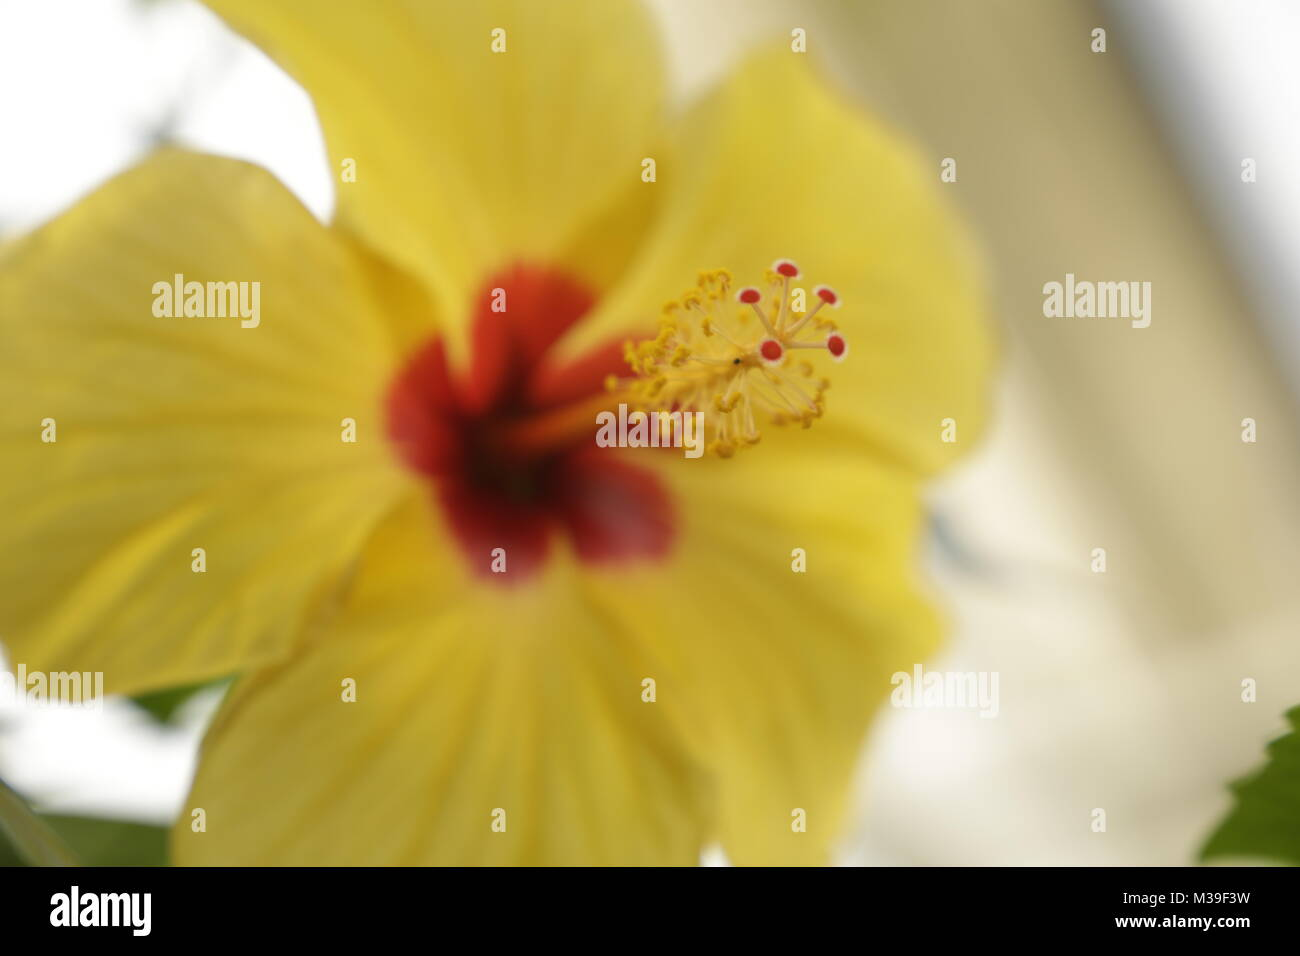 Yellow hibiscus flower - Stock Image